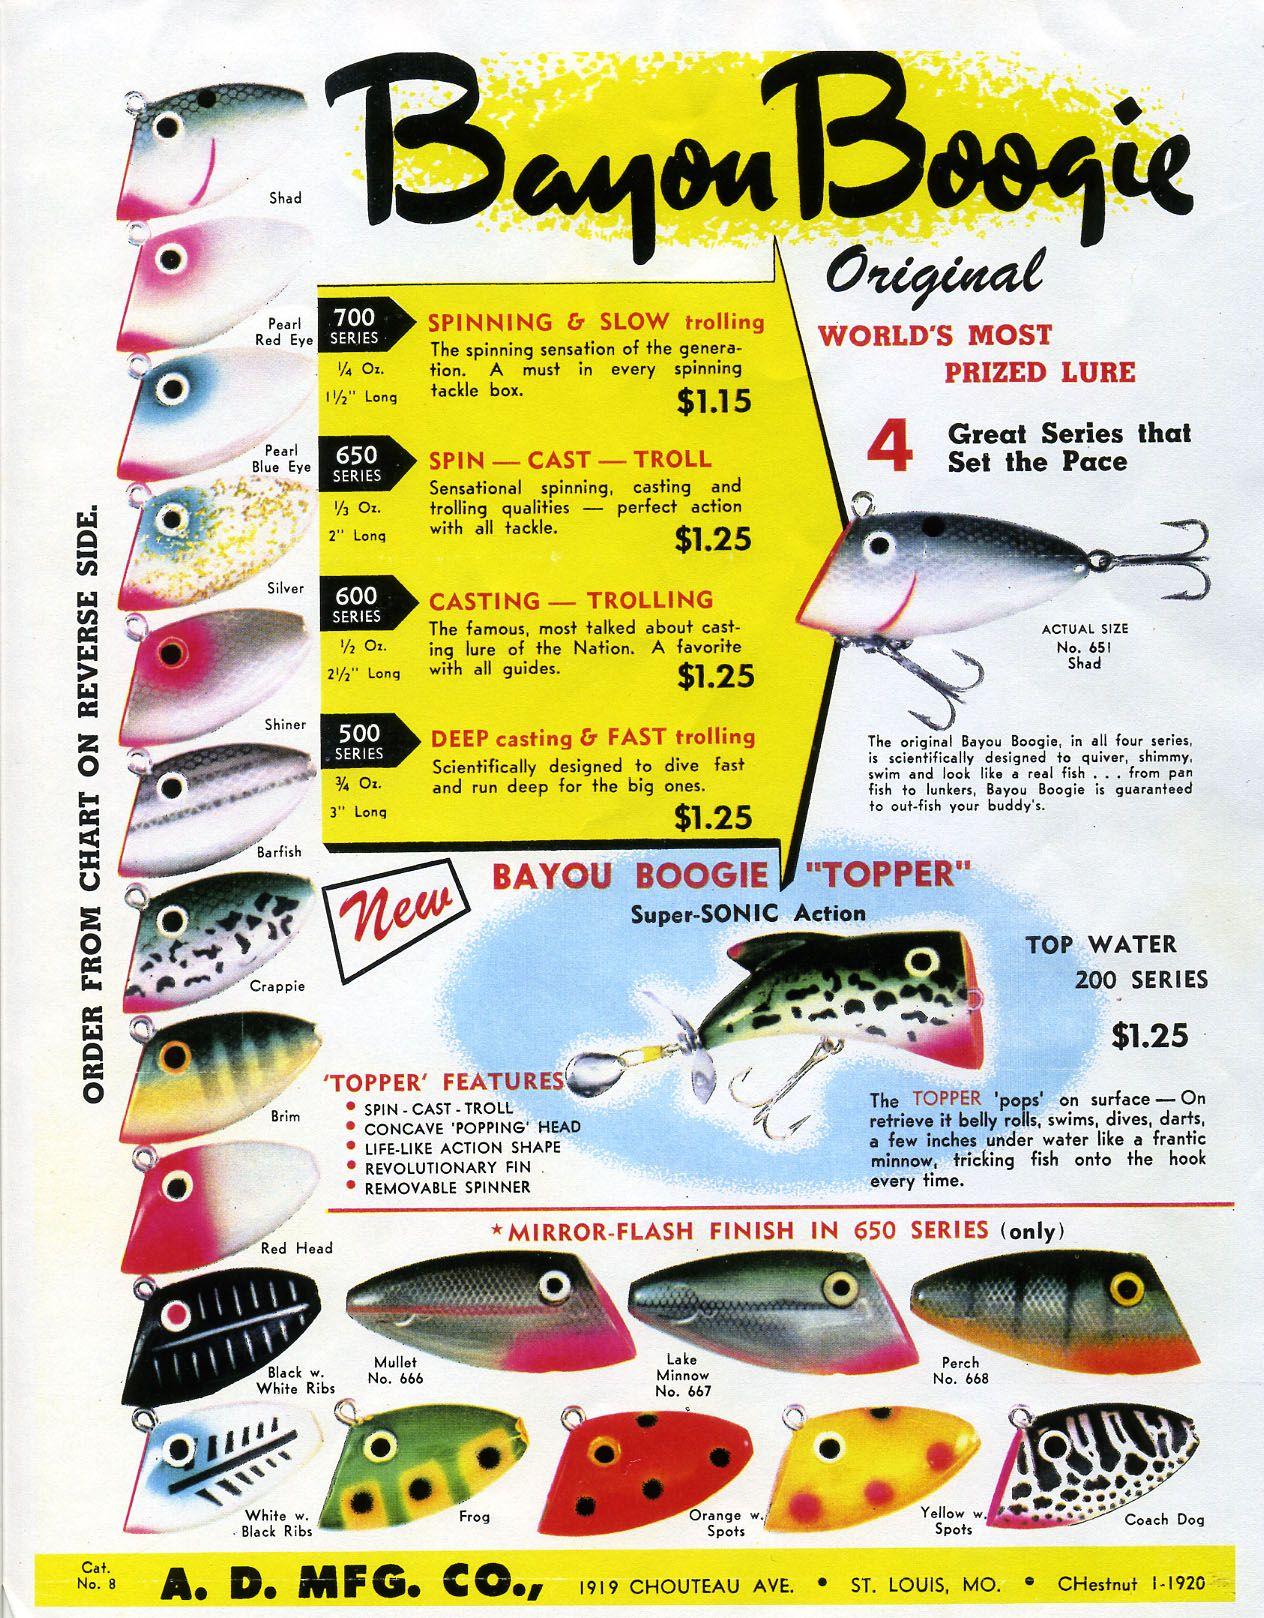 Whopper stopper bayou boogie vintage color chart fishing lure fishing lures whopper stopper bayou boogie vintage color chart nvjuhfo Gallery